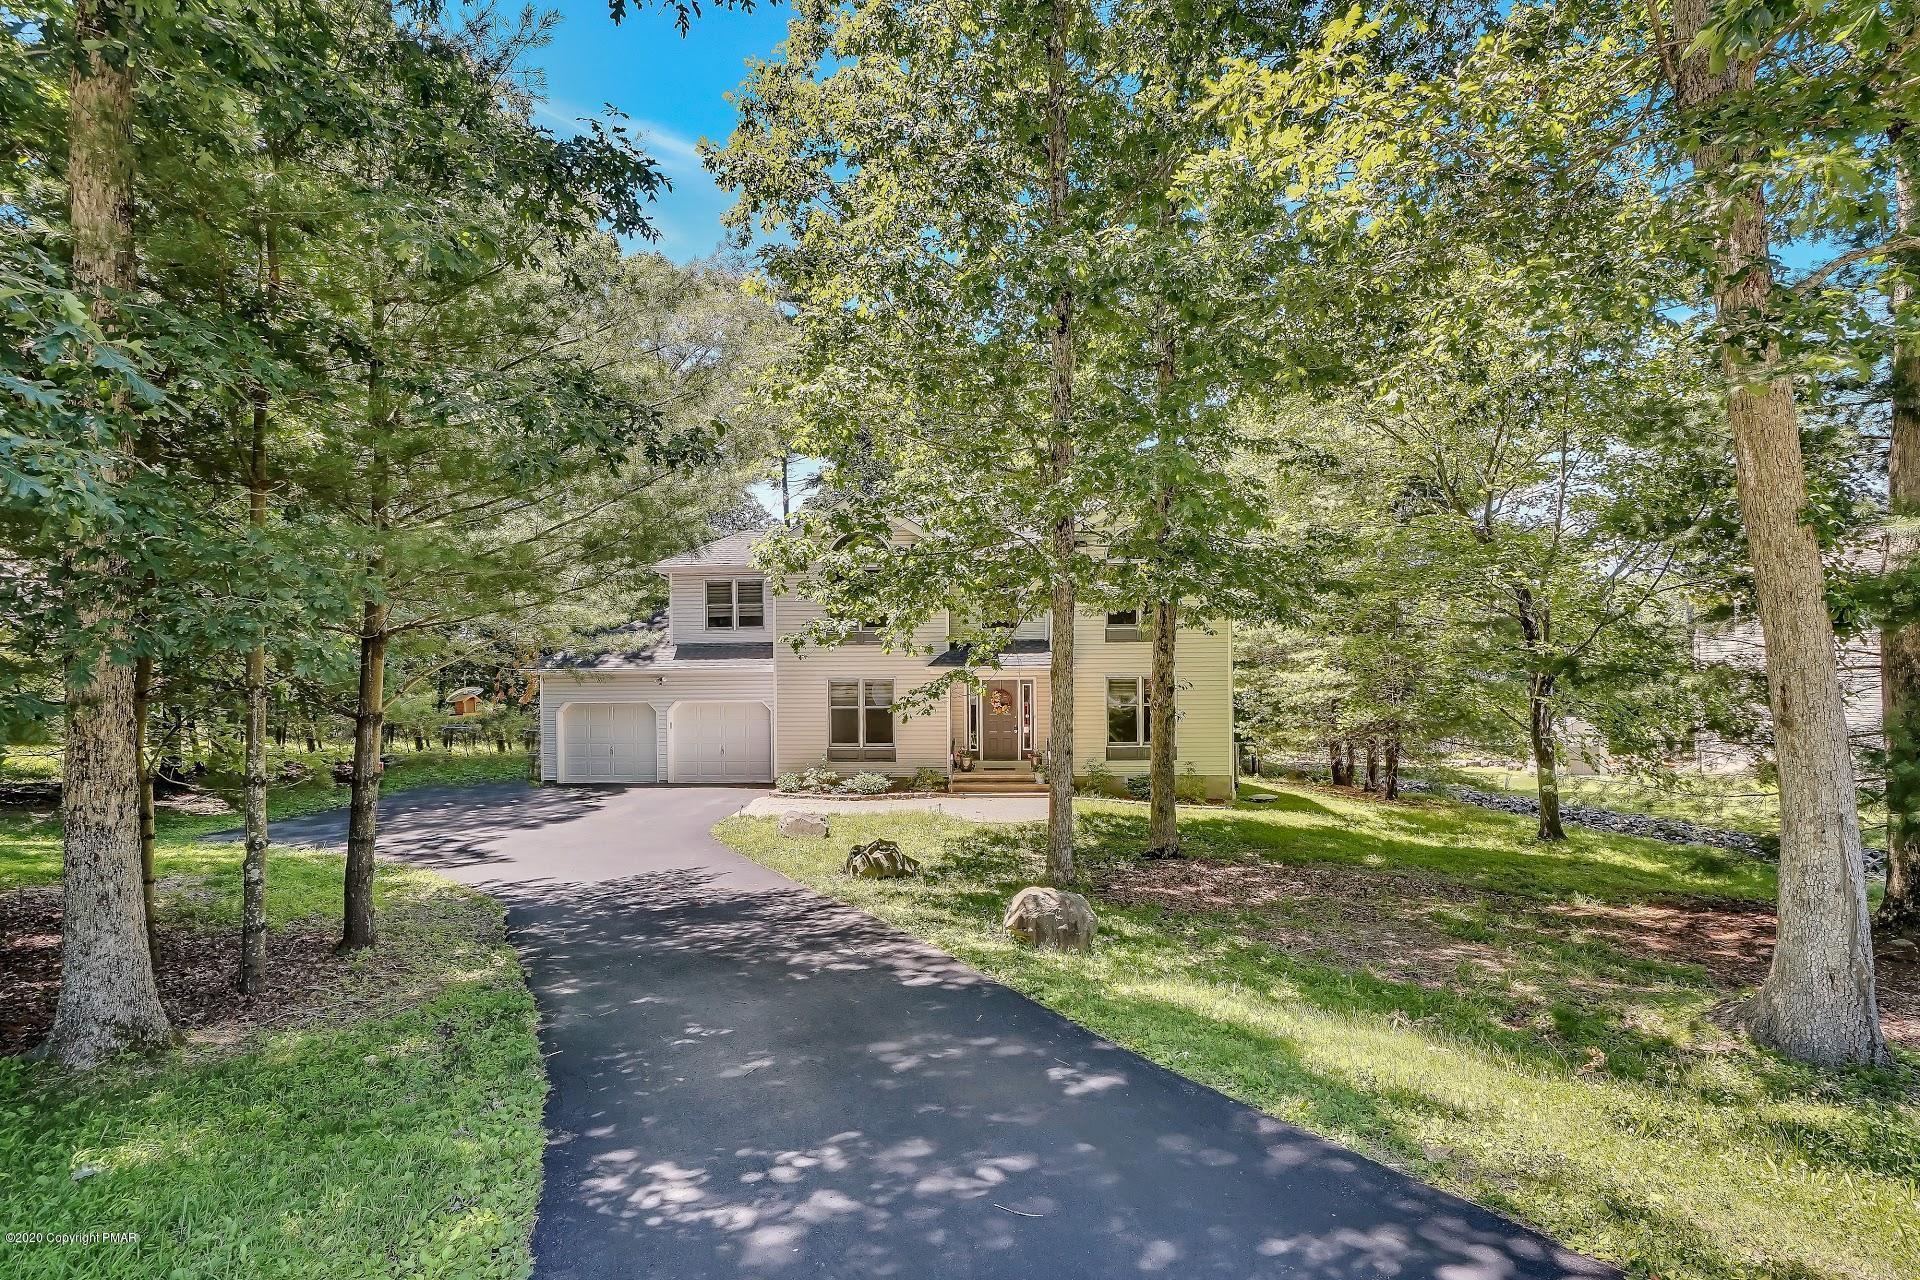 5294 Hilltop Cir, East Stroudsburg, PA 18301